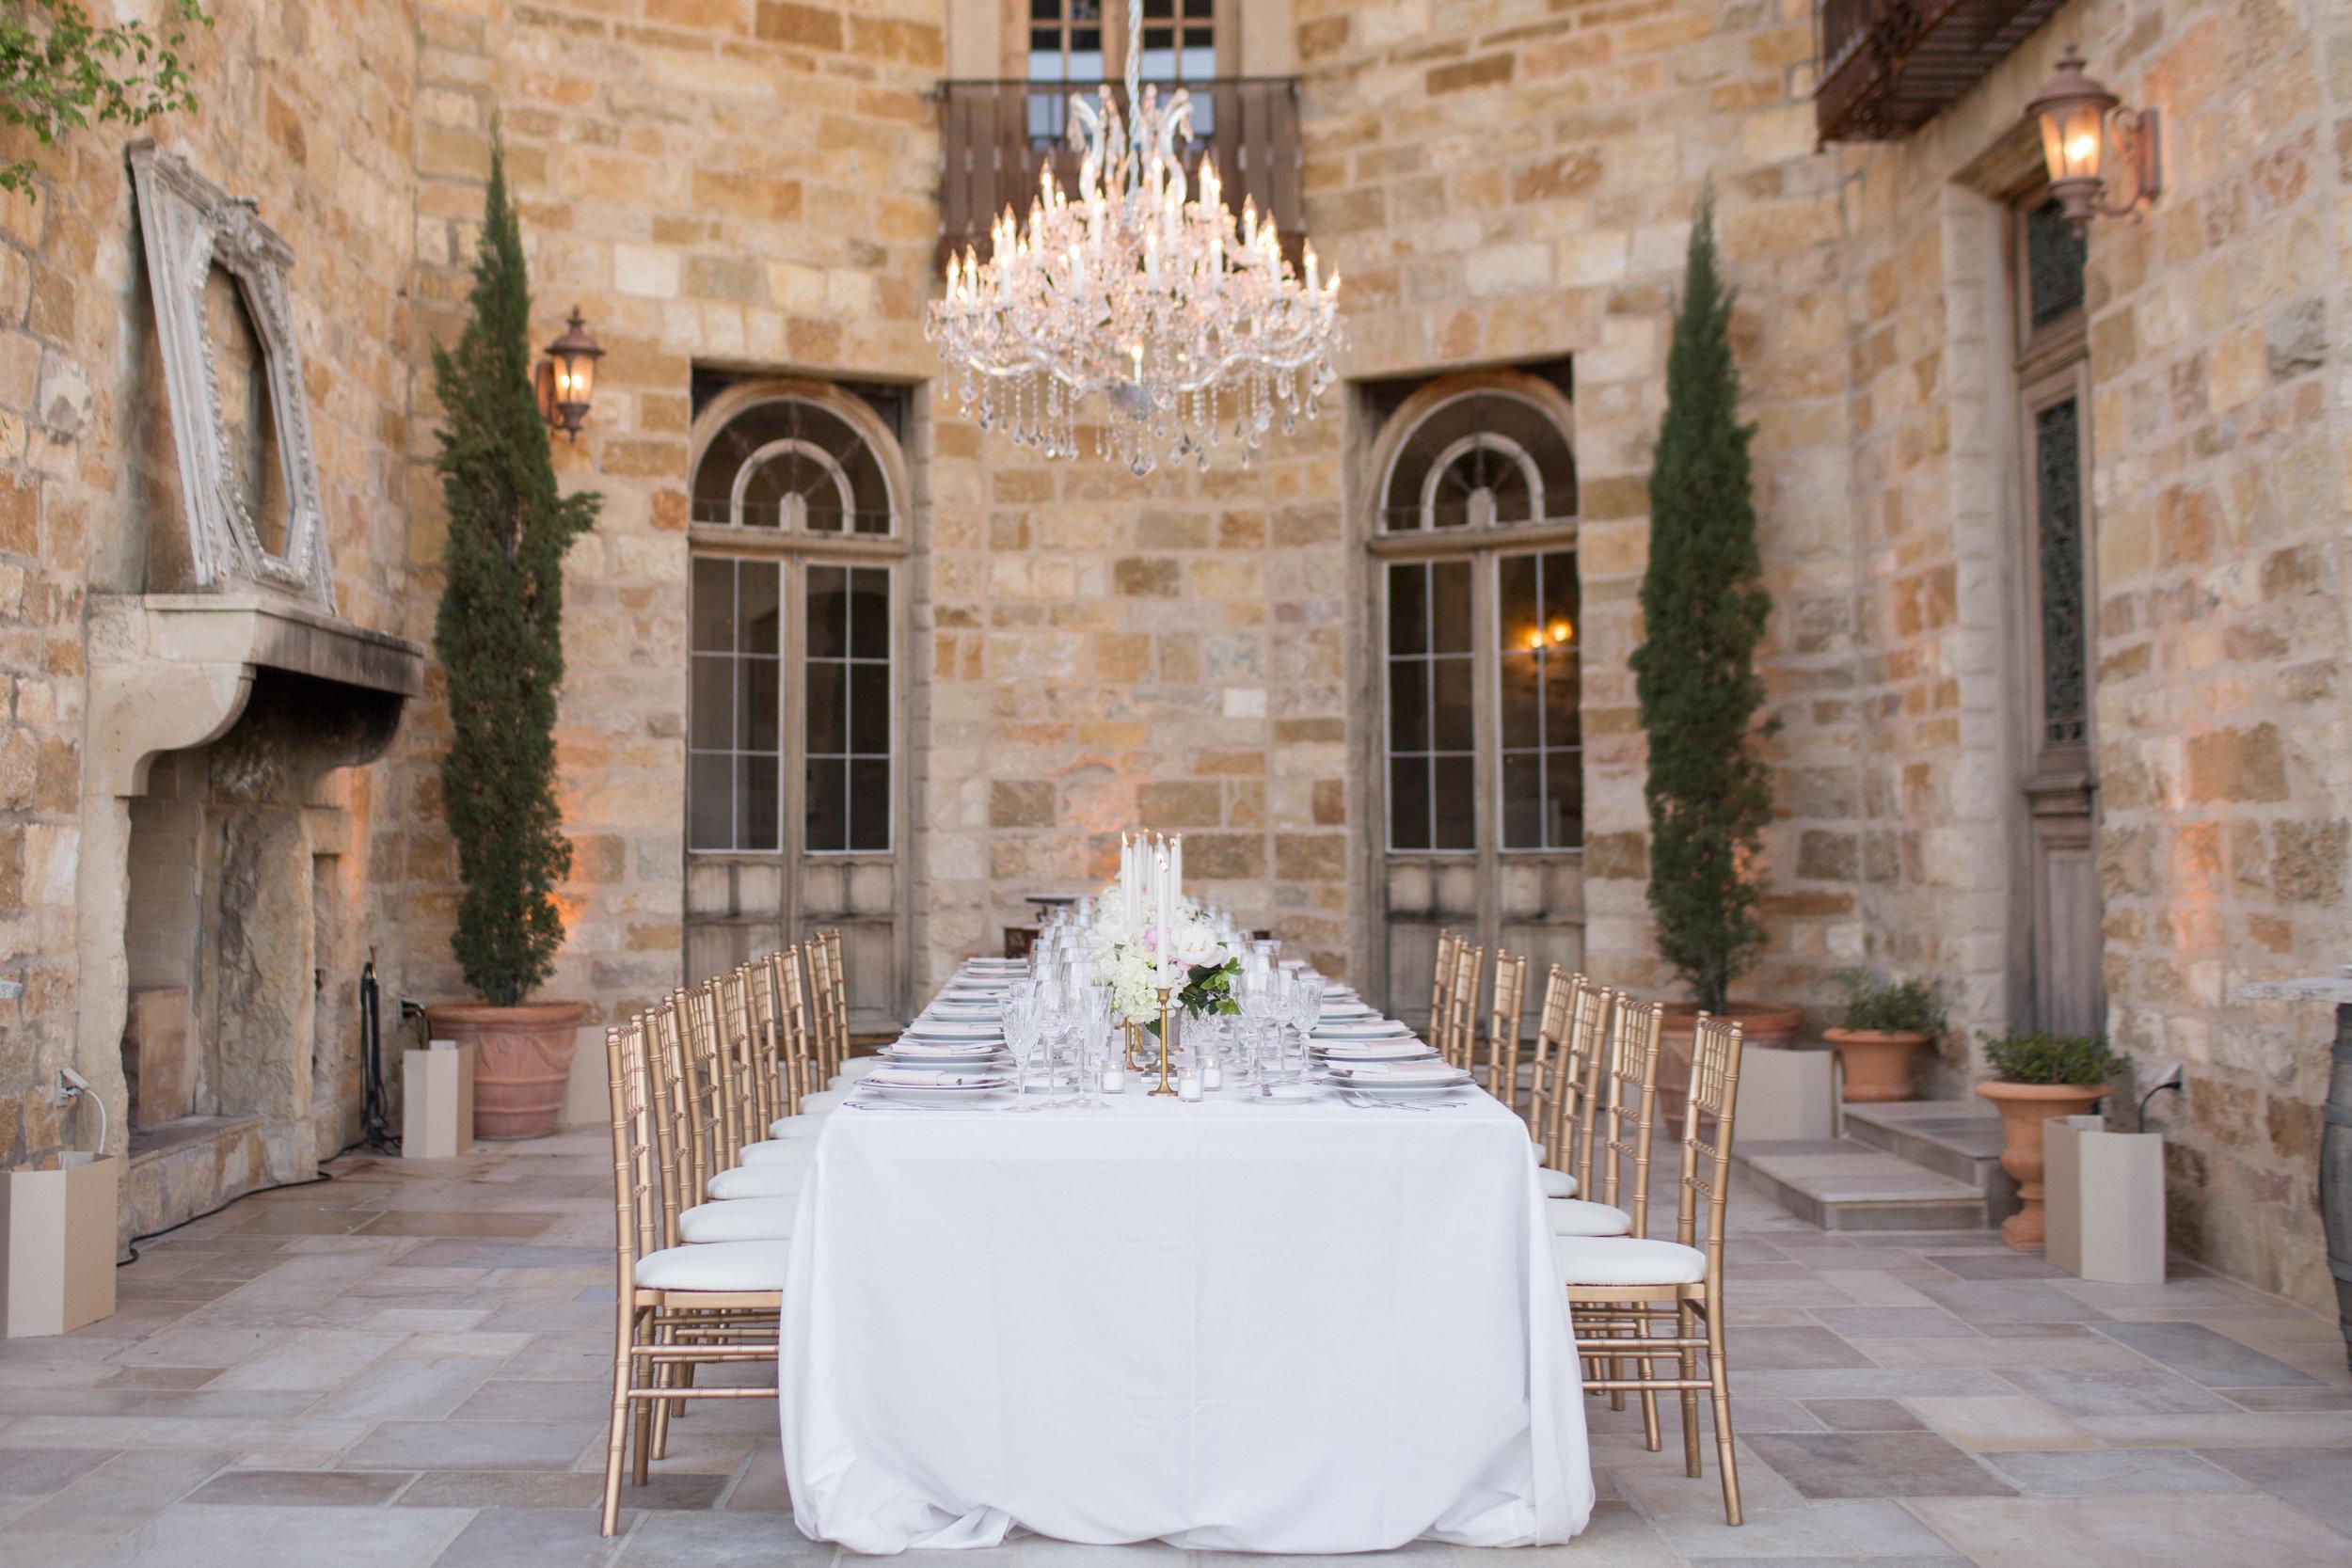 santa-barbara-elopement-wedding-planner-planning-coordinator-event-day-of-sunstone-winery-villa-tuscan-vineyard-gold-classic-elope (13).jpg